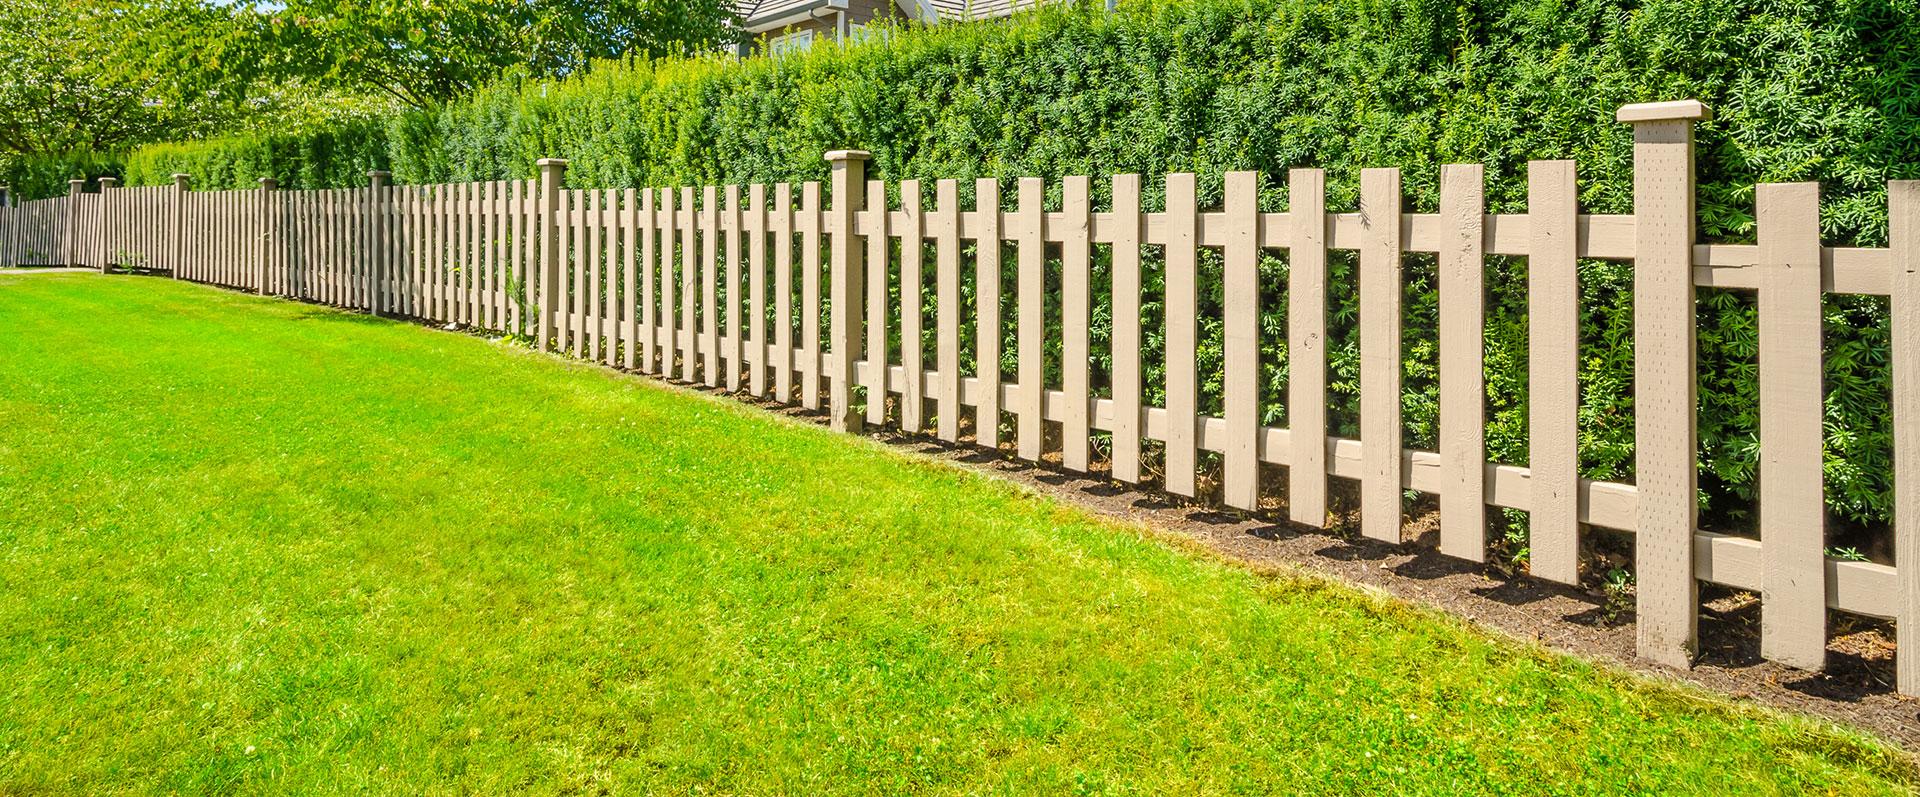 Fencing Contractor, Security Gates, Guard Rails: Battle Creek ... on home with cedar fence, concrete fences and gates designs, house fence and gate designs, philippines fences and gates designs, wooden gate designs, garden fences and gates designs, modern concrete home designs,